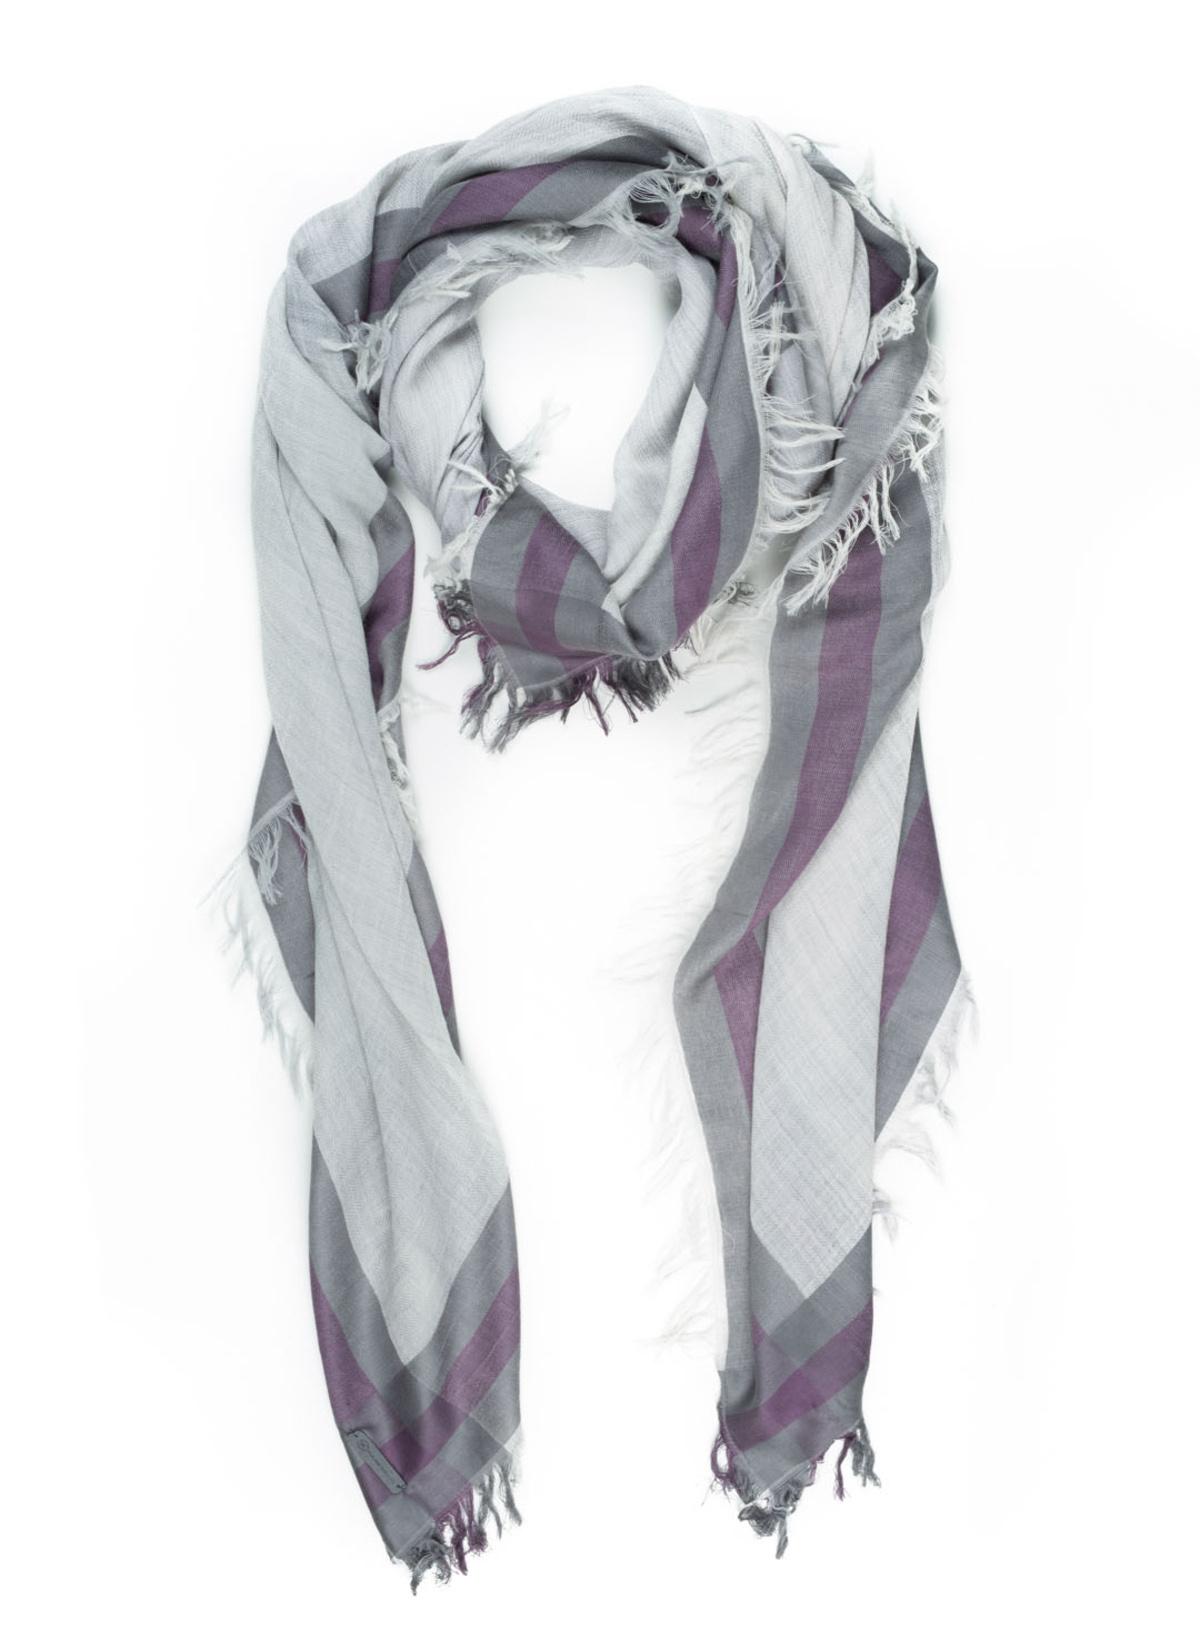 Silk And Cashmere Şal A191f310008 İpek Karışımlı Jas Kare Şal – 385.0 TL